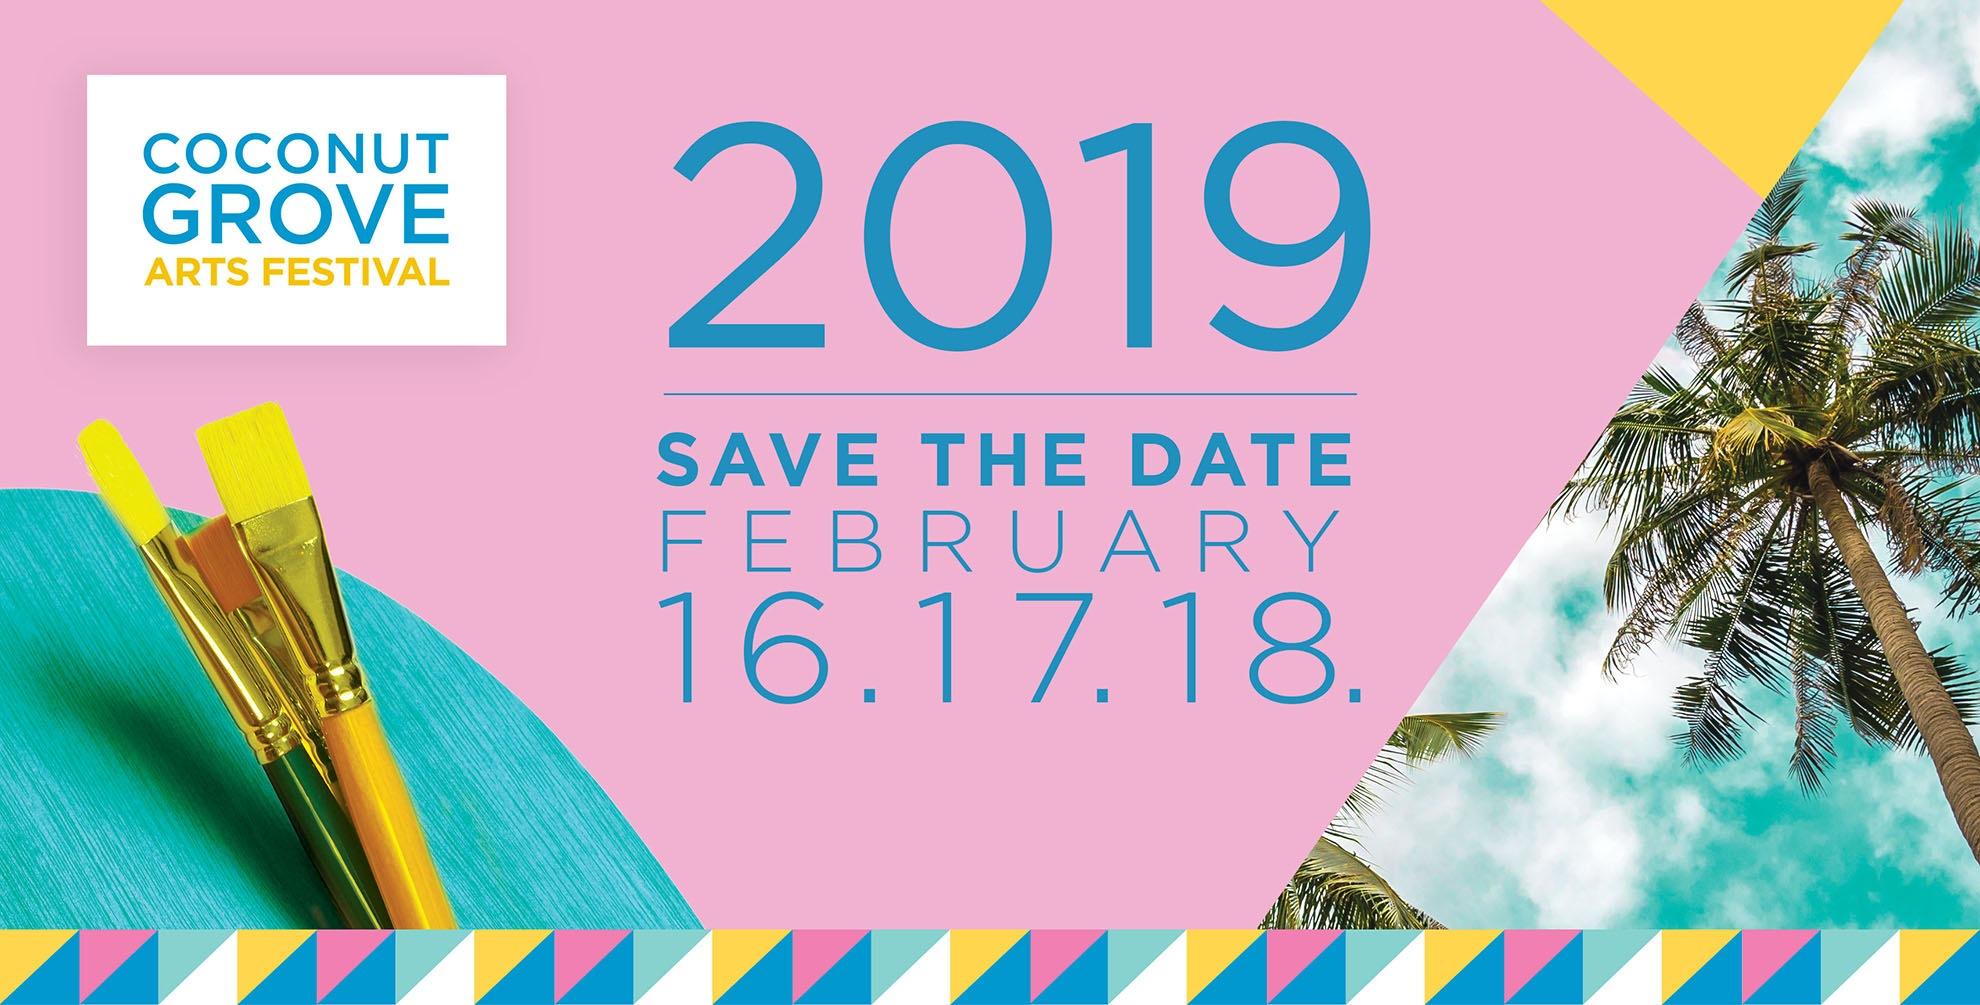 Coconut Grove Arts Festival 2019miamigo Tv